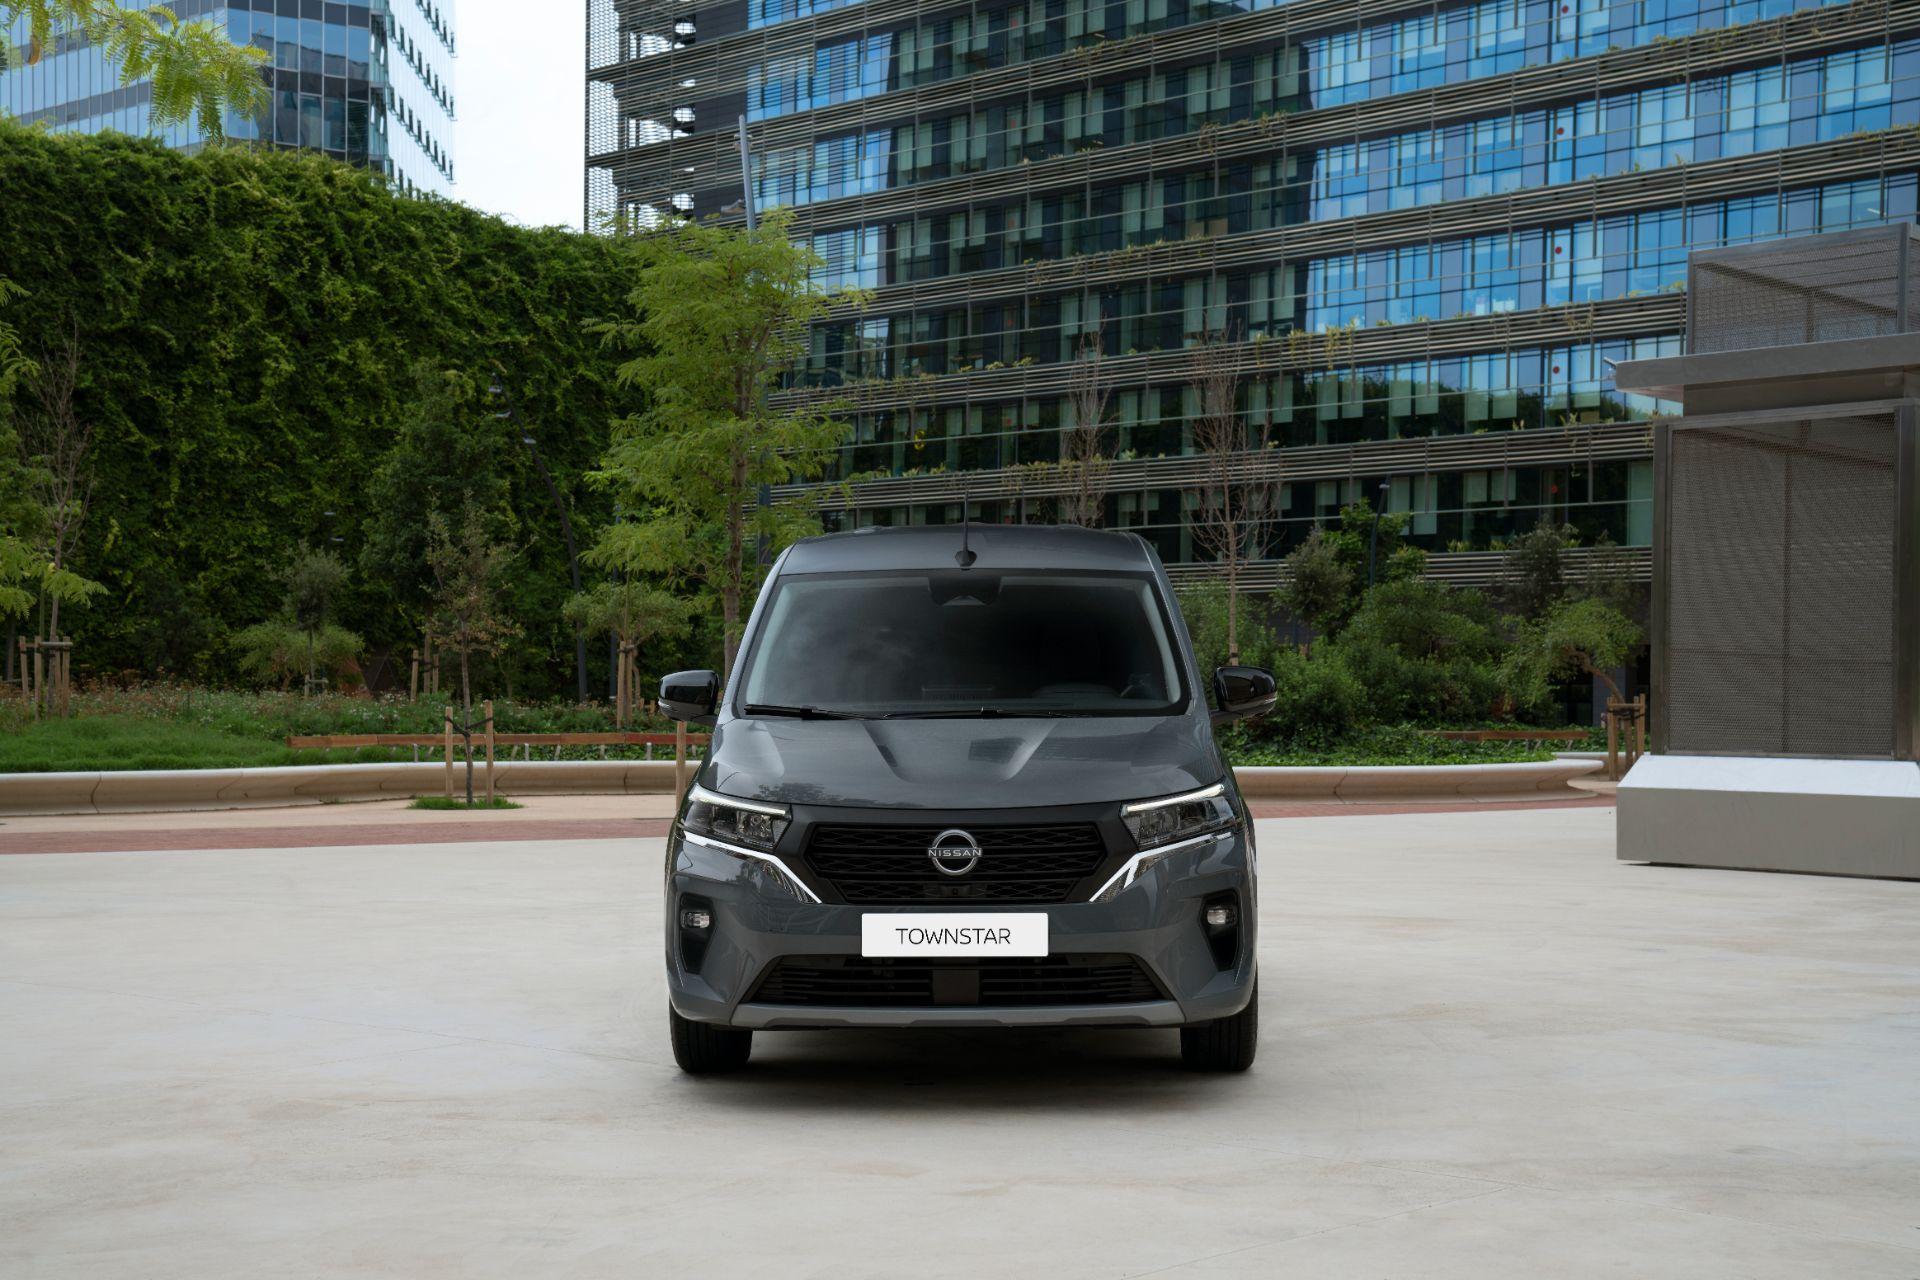 2022-Nissan-Townstar-petrol-van-dynamic-10